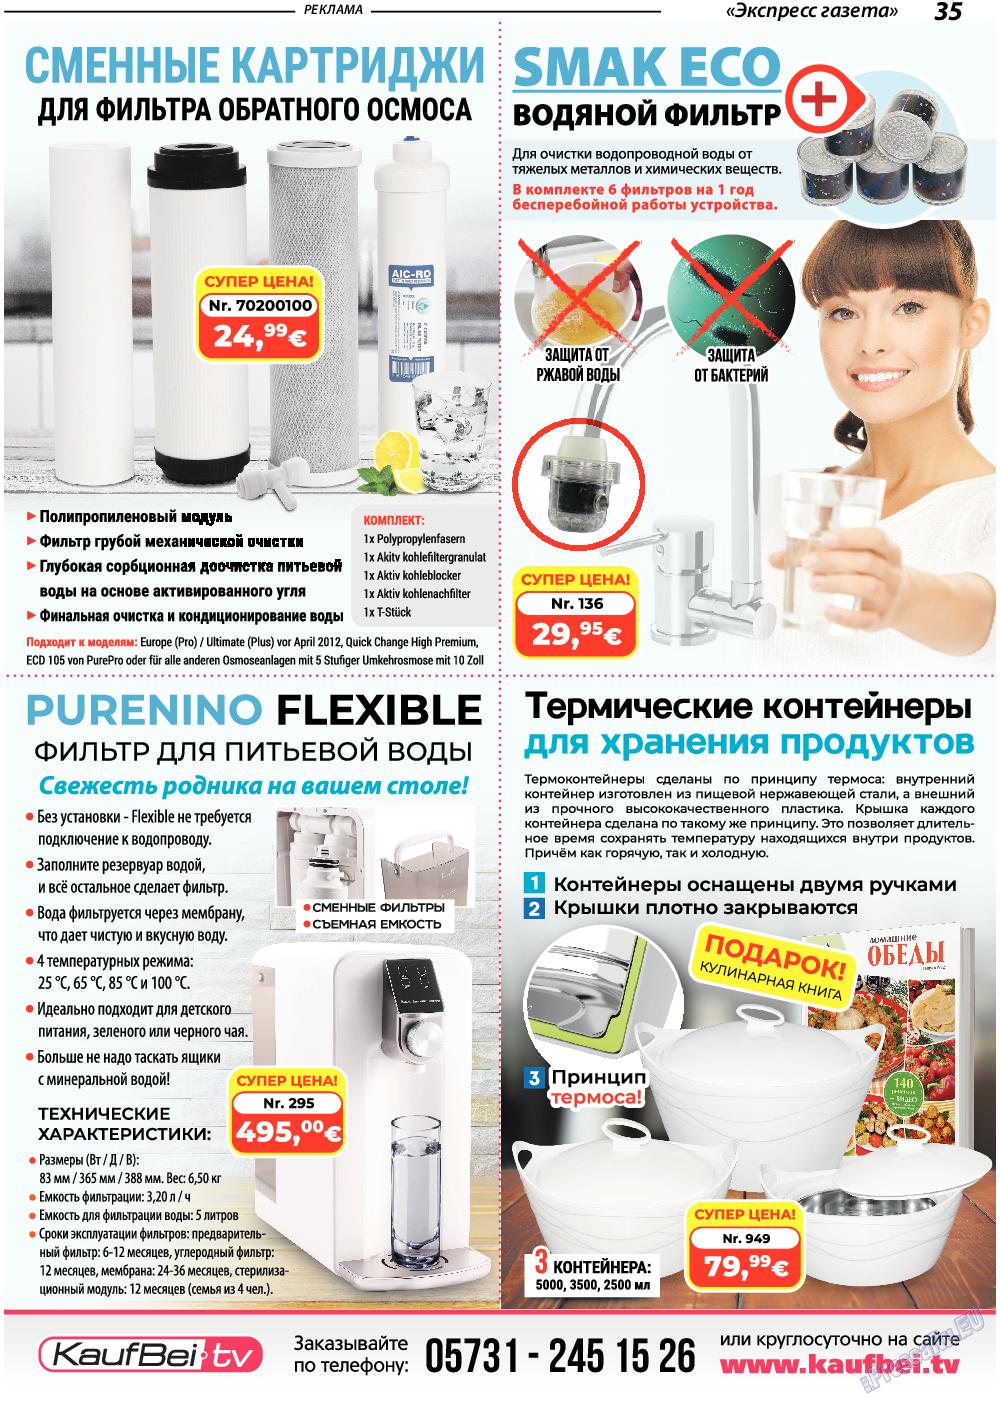 Экспресс газета (газета). 2019 год, номер 9, стр. 35